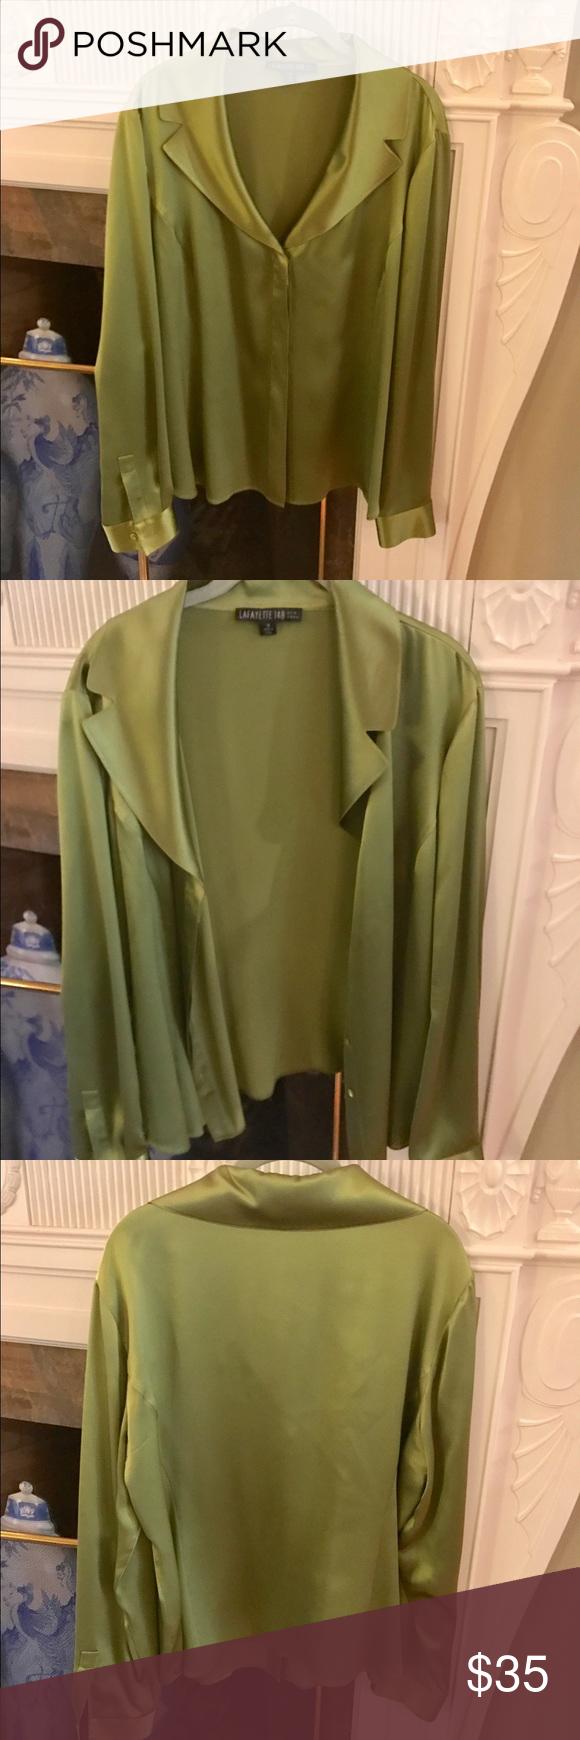 🆕 Lafayette 148 Silk Blouse Lafayette 148 blouse. 100% Silk. In perfect condition. Lafayette 148 New York Tops